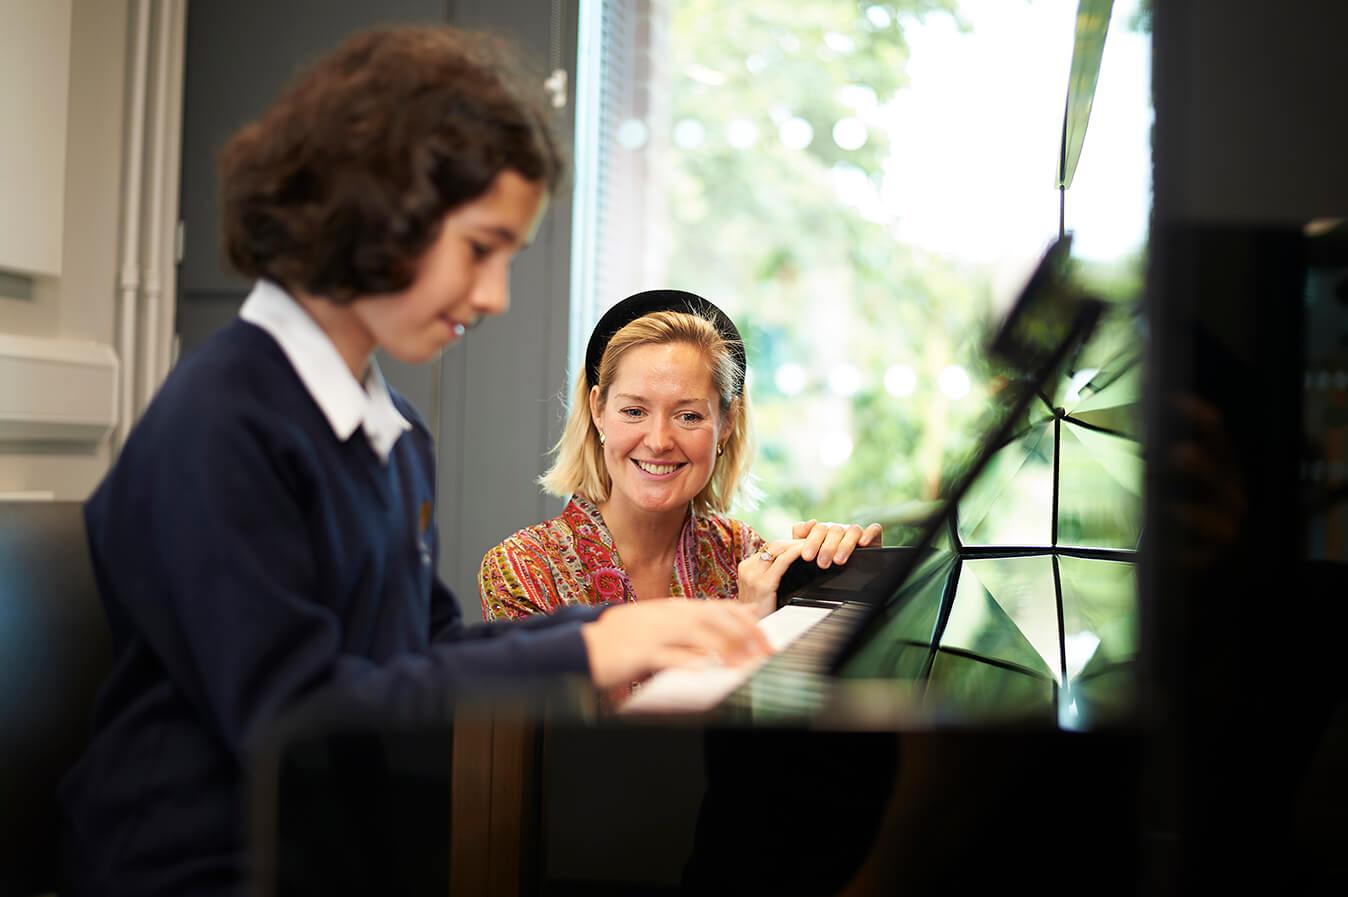 Teacher teaching piano to a girl